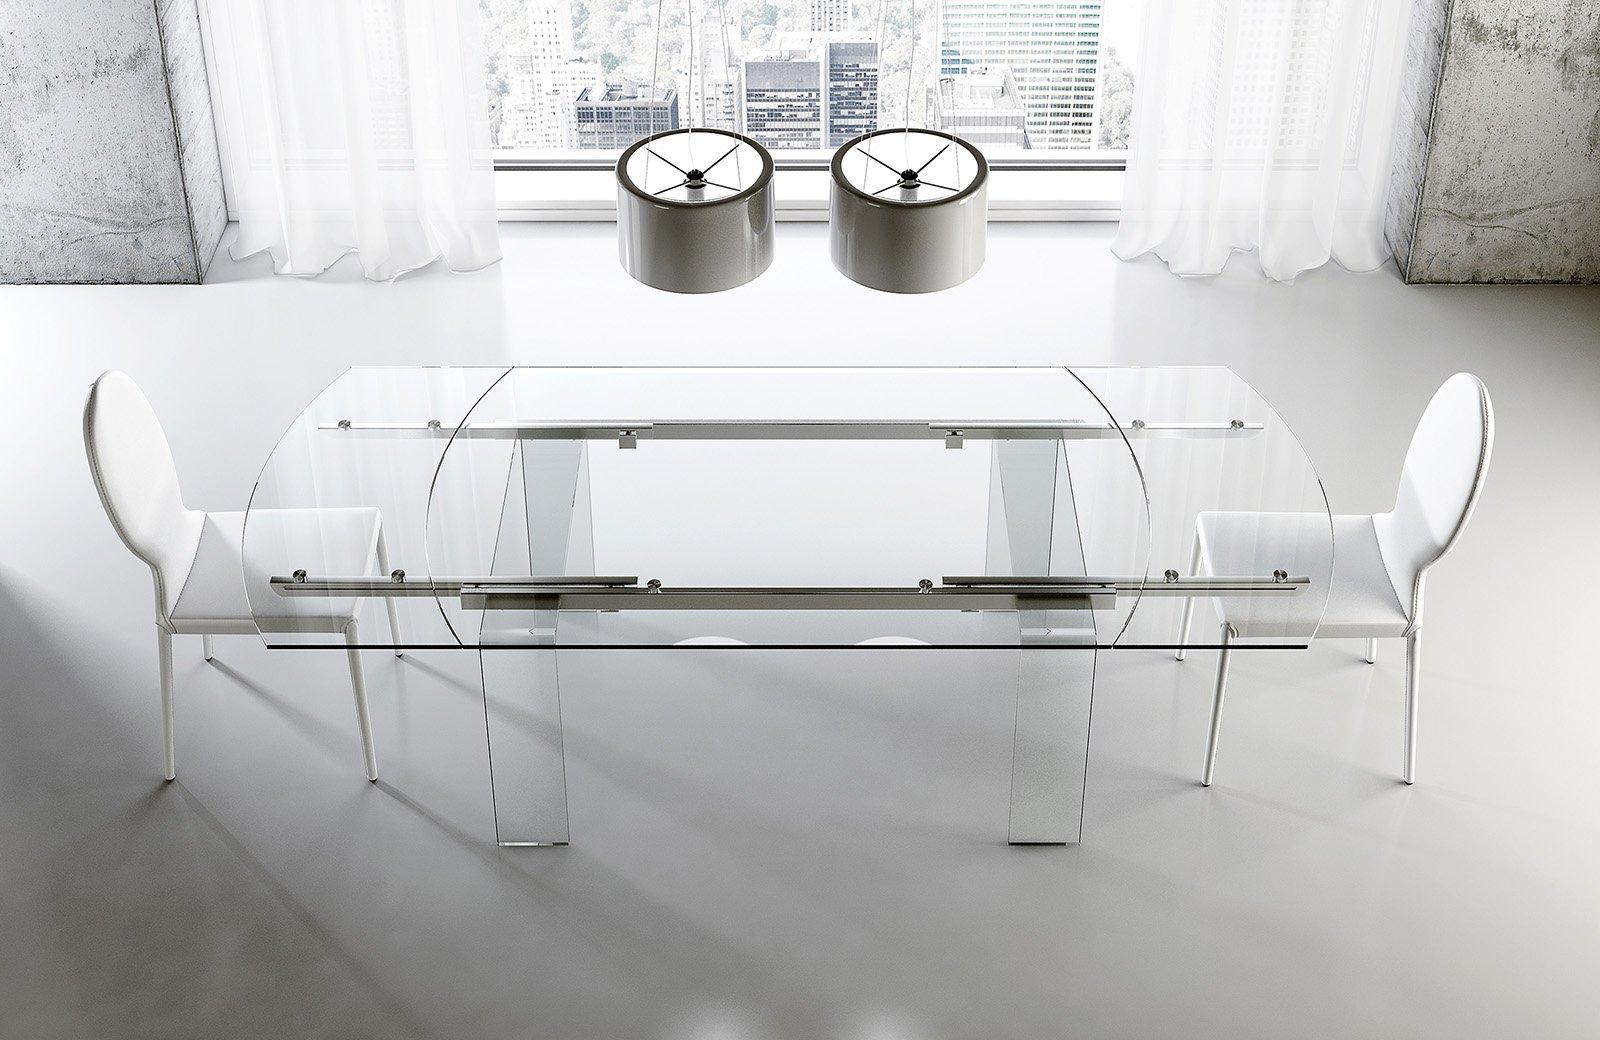 Tavoli Da Pranzo Moderni In Cristallo : Tavoli Da Pranzo Moderni  #575346 1600 1040 Tavoli Da Pranzo Moderni In Cristallo